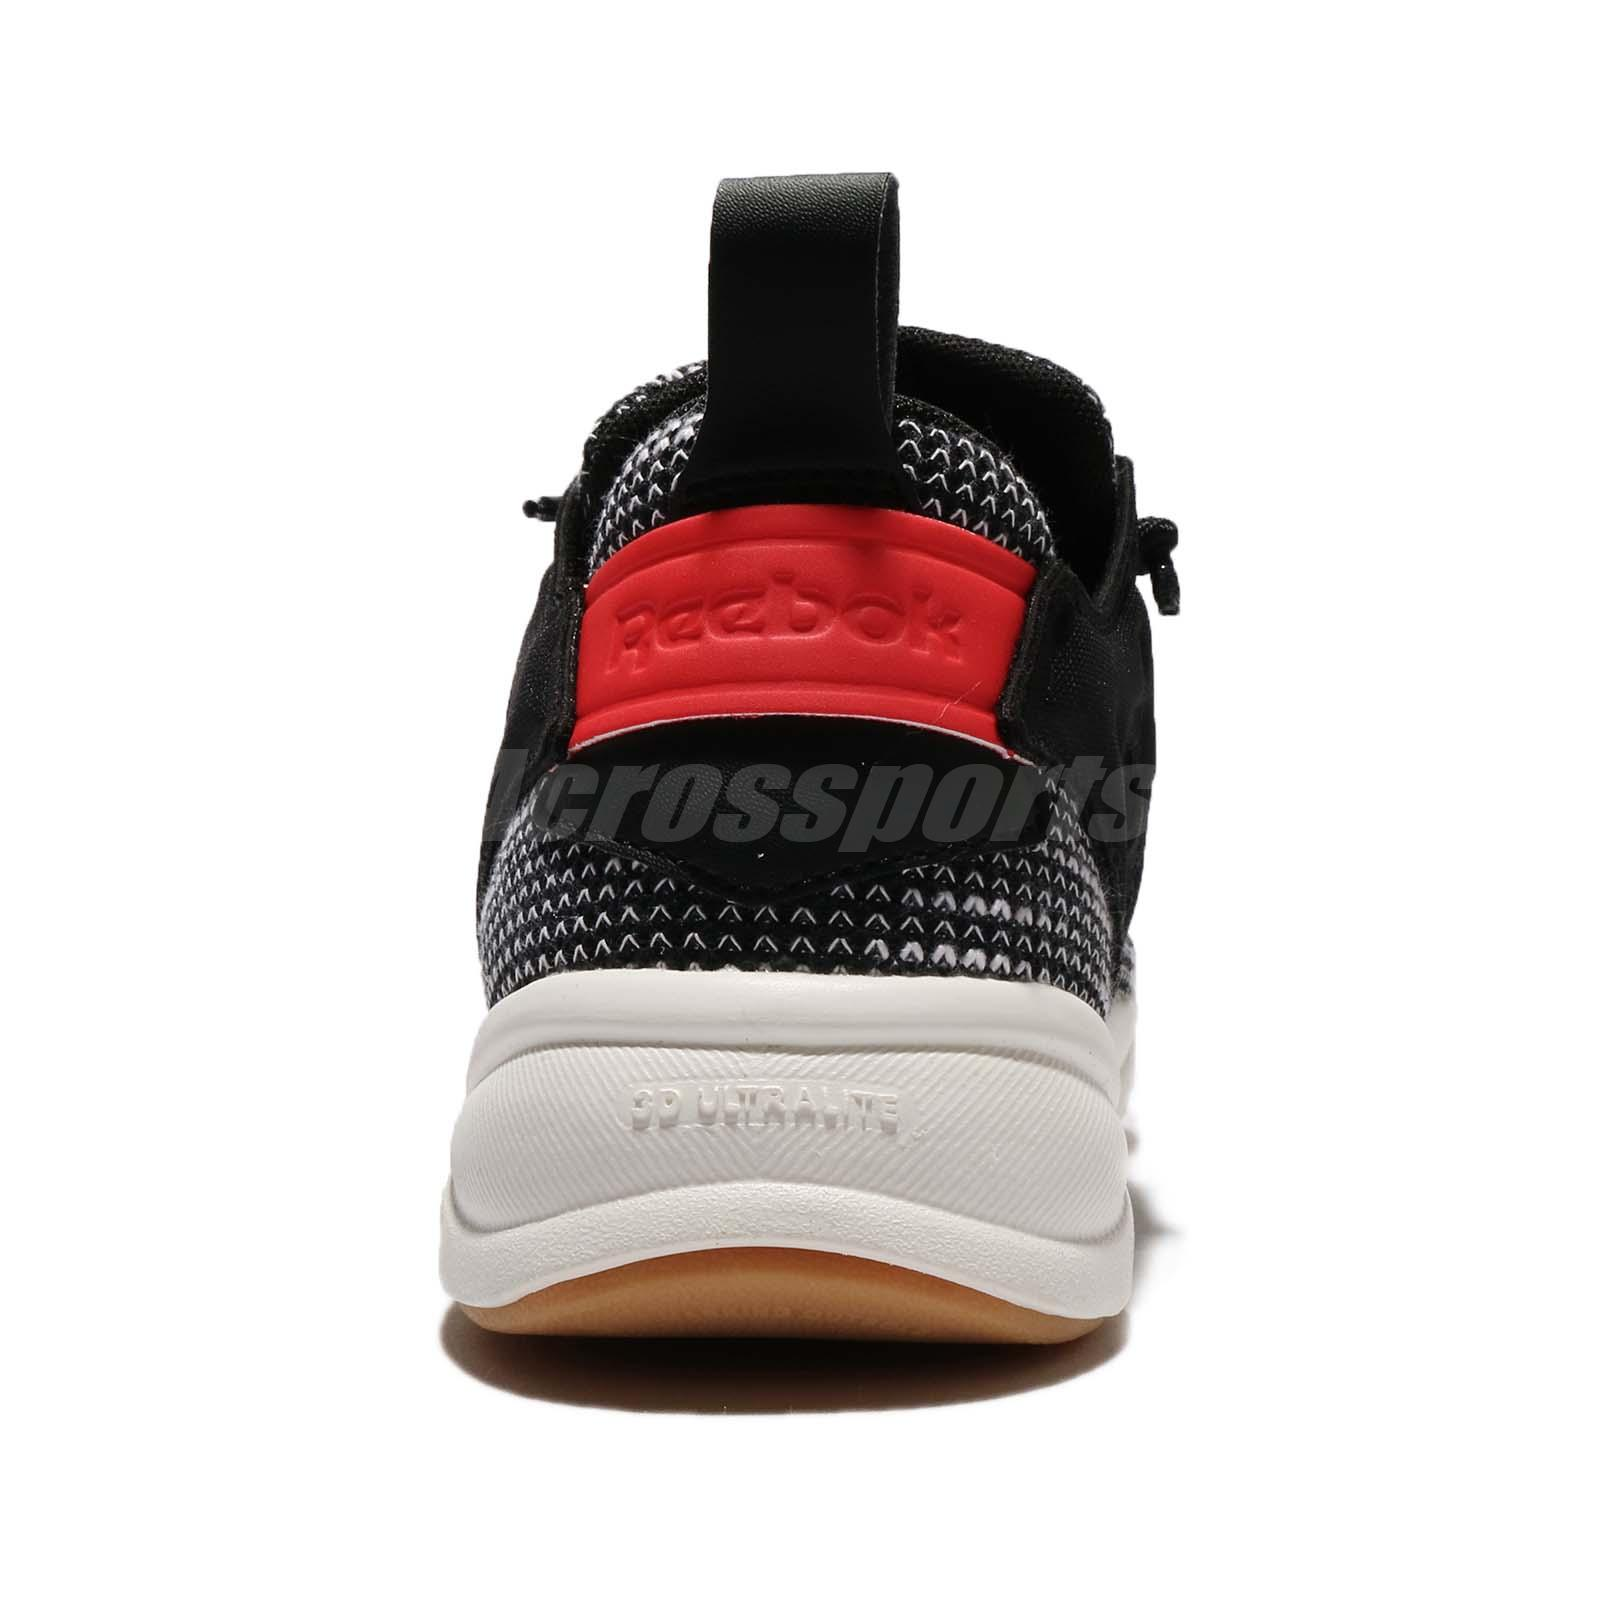 Reebok Furylite FBT Black Glow Red Chalk Women Running Shoes ... 93abd54d9